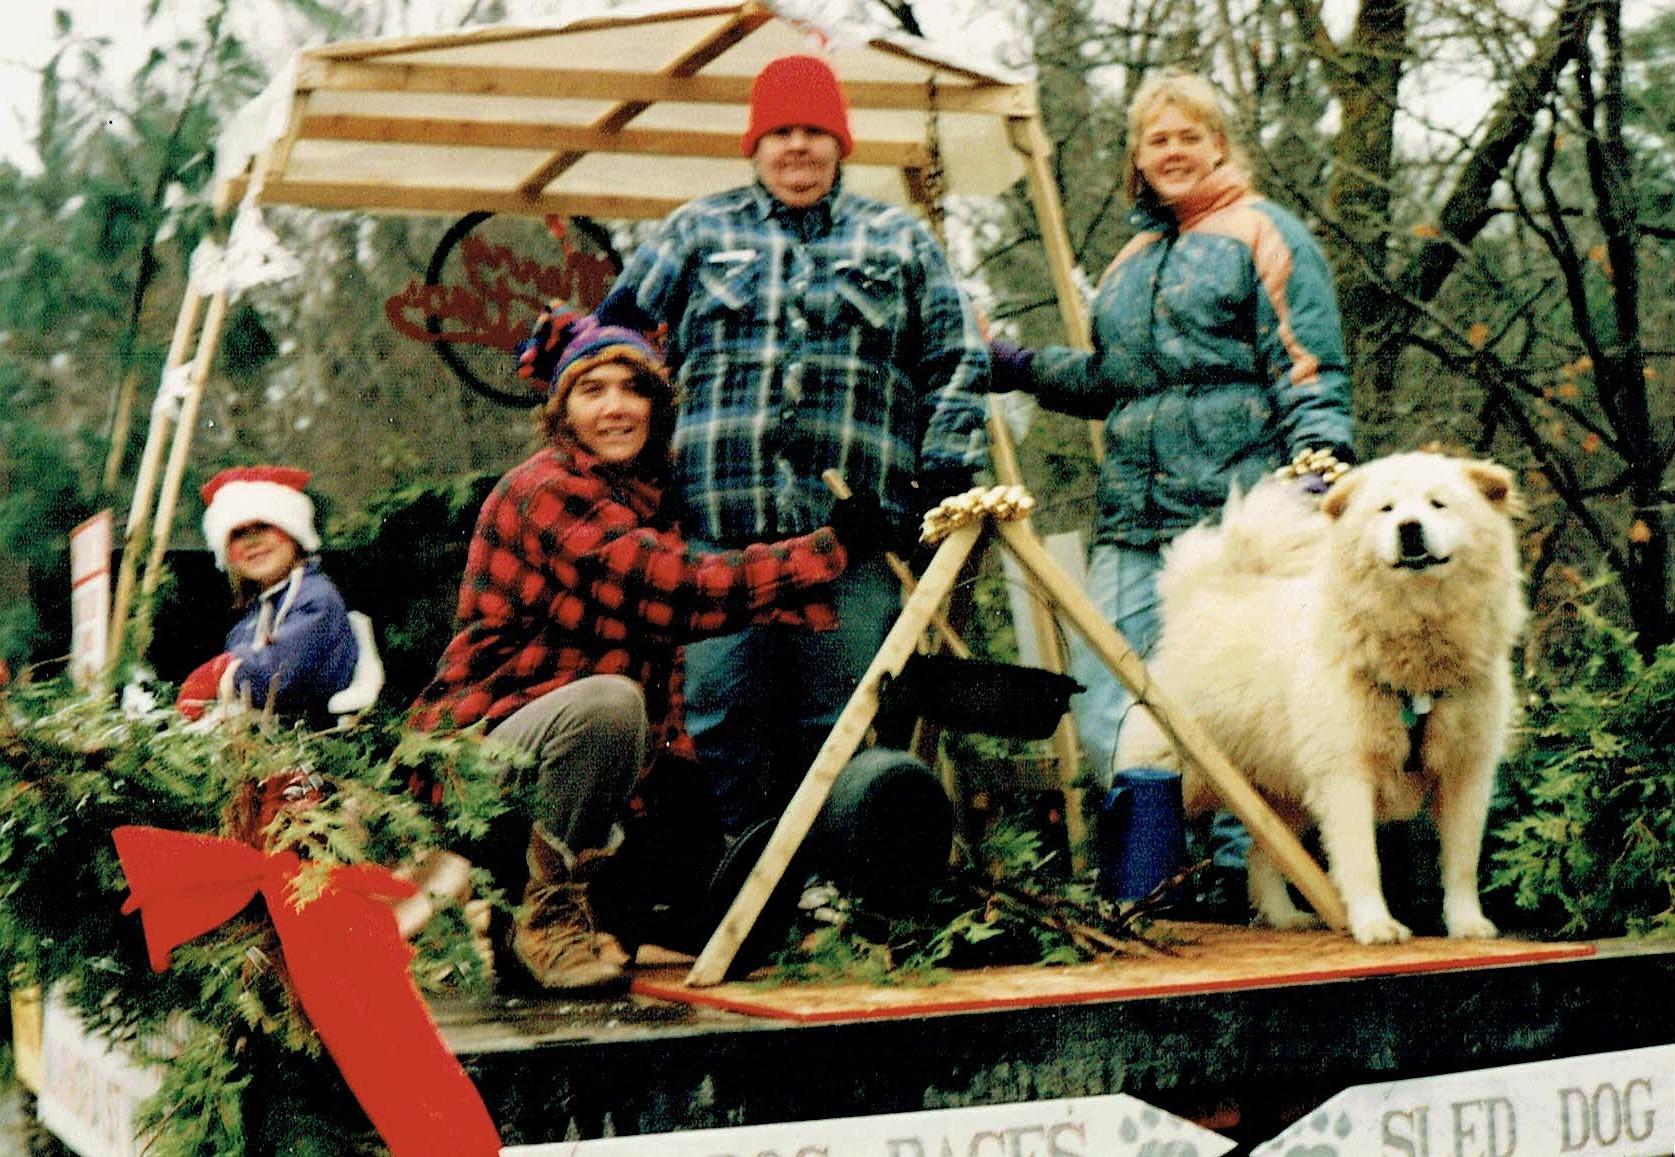 Snofest circa 1995